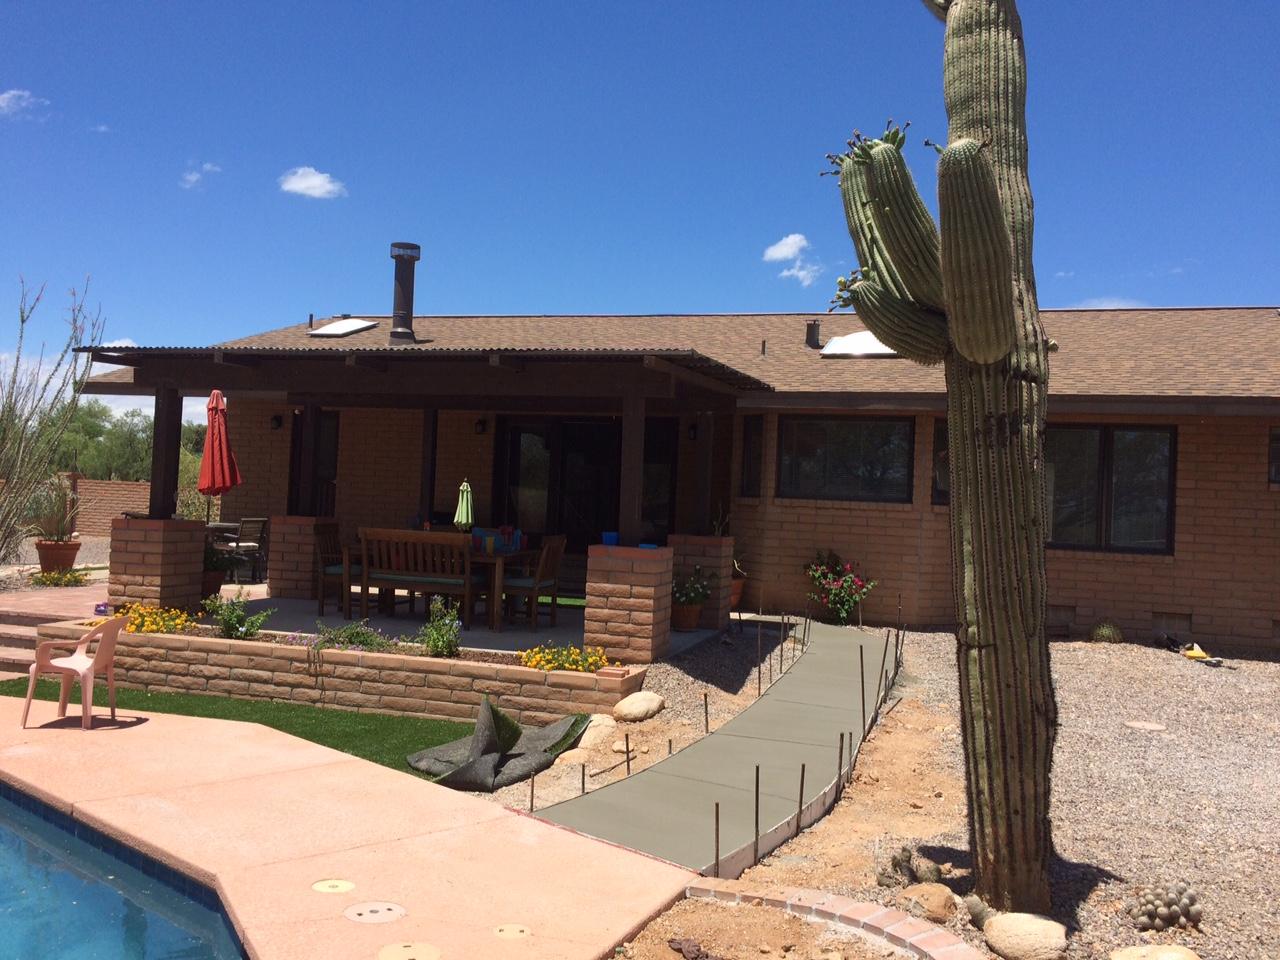 Landscaper Serving Tucson - Arizona Landshapes LLC